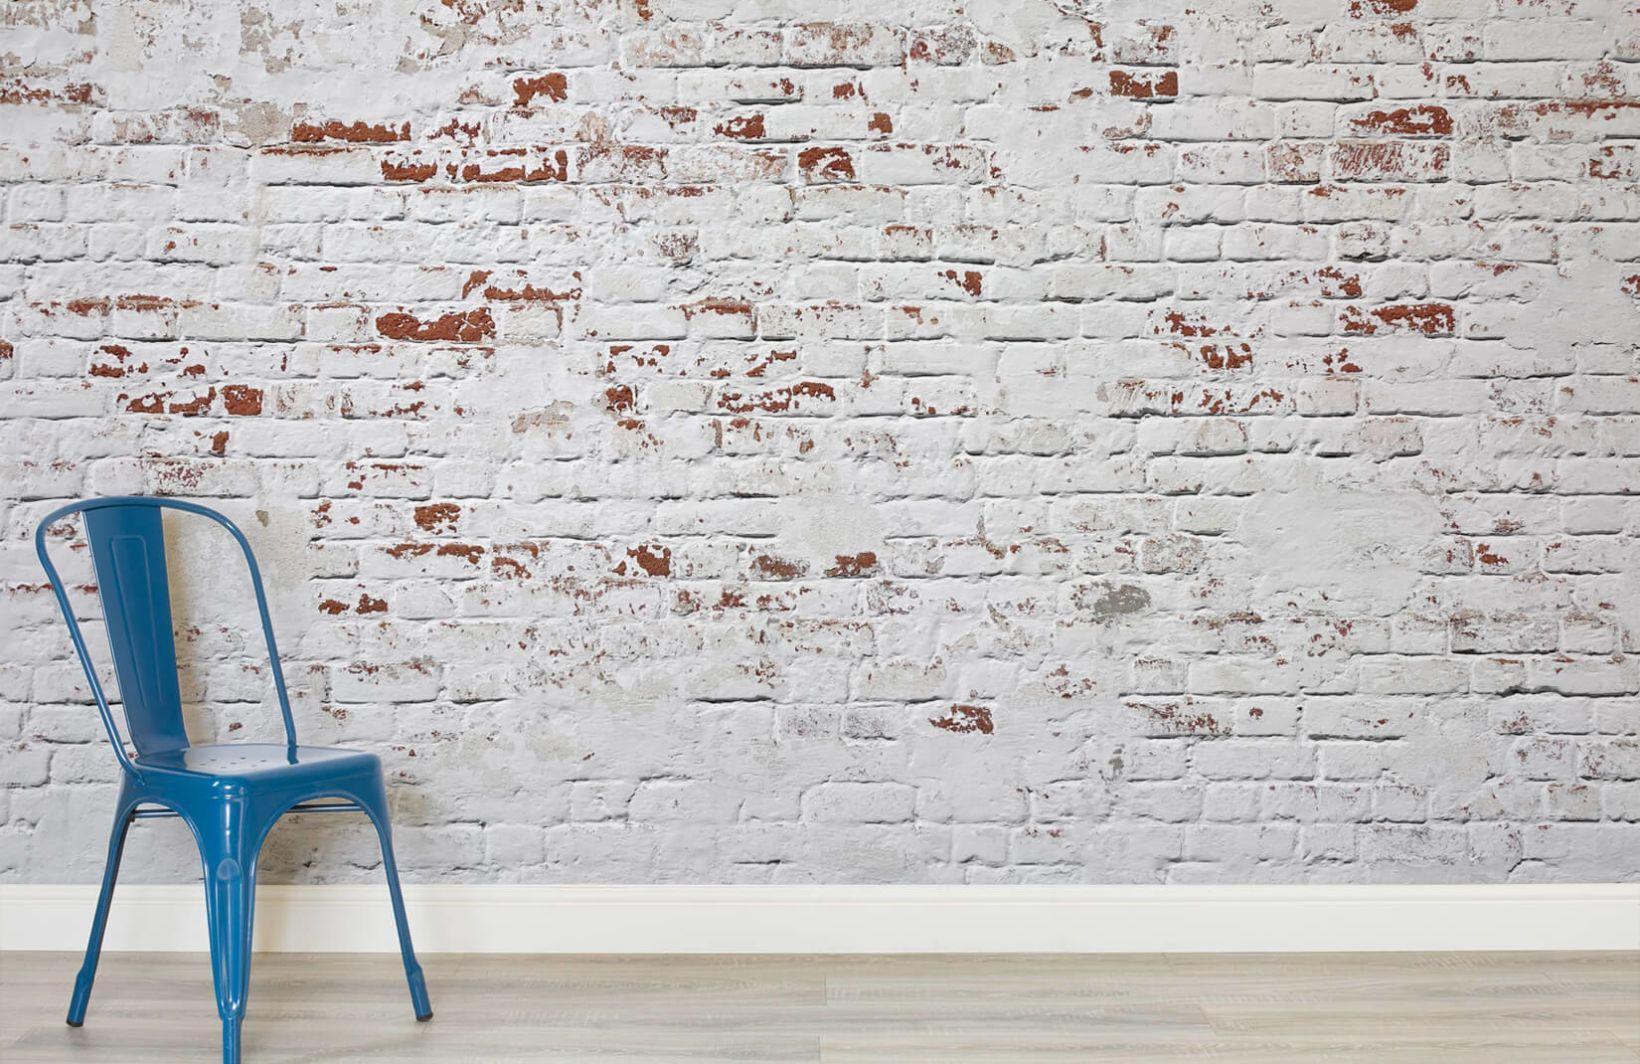 Warehouse Brick Wall Wallpaper Mural Muralswallpaper Brick Wallpaper Mural Brick Wall Brick Wall Wallpaper